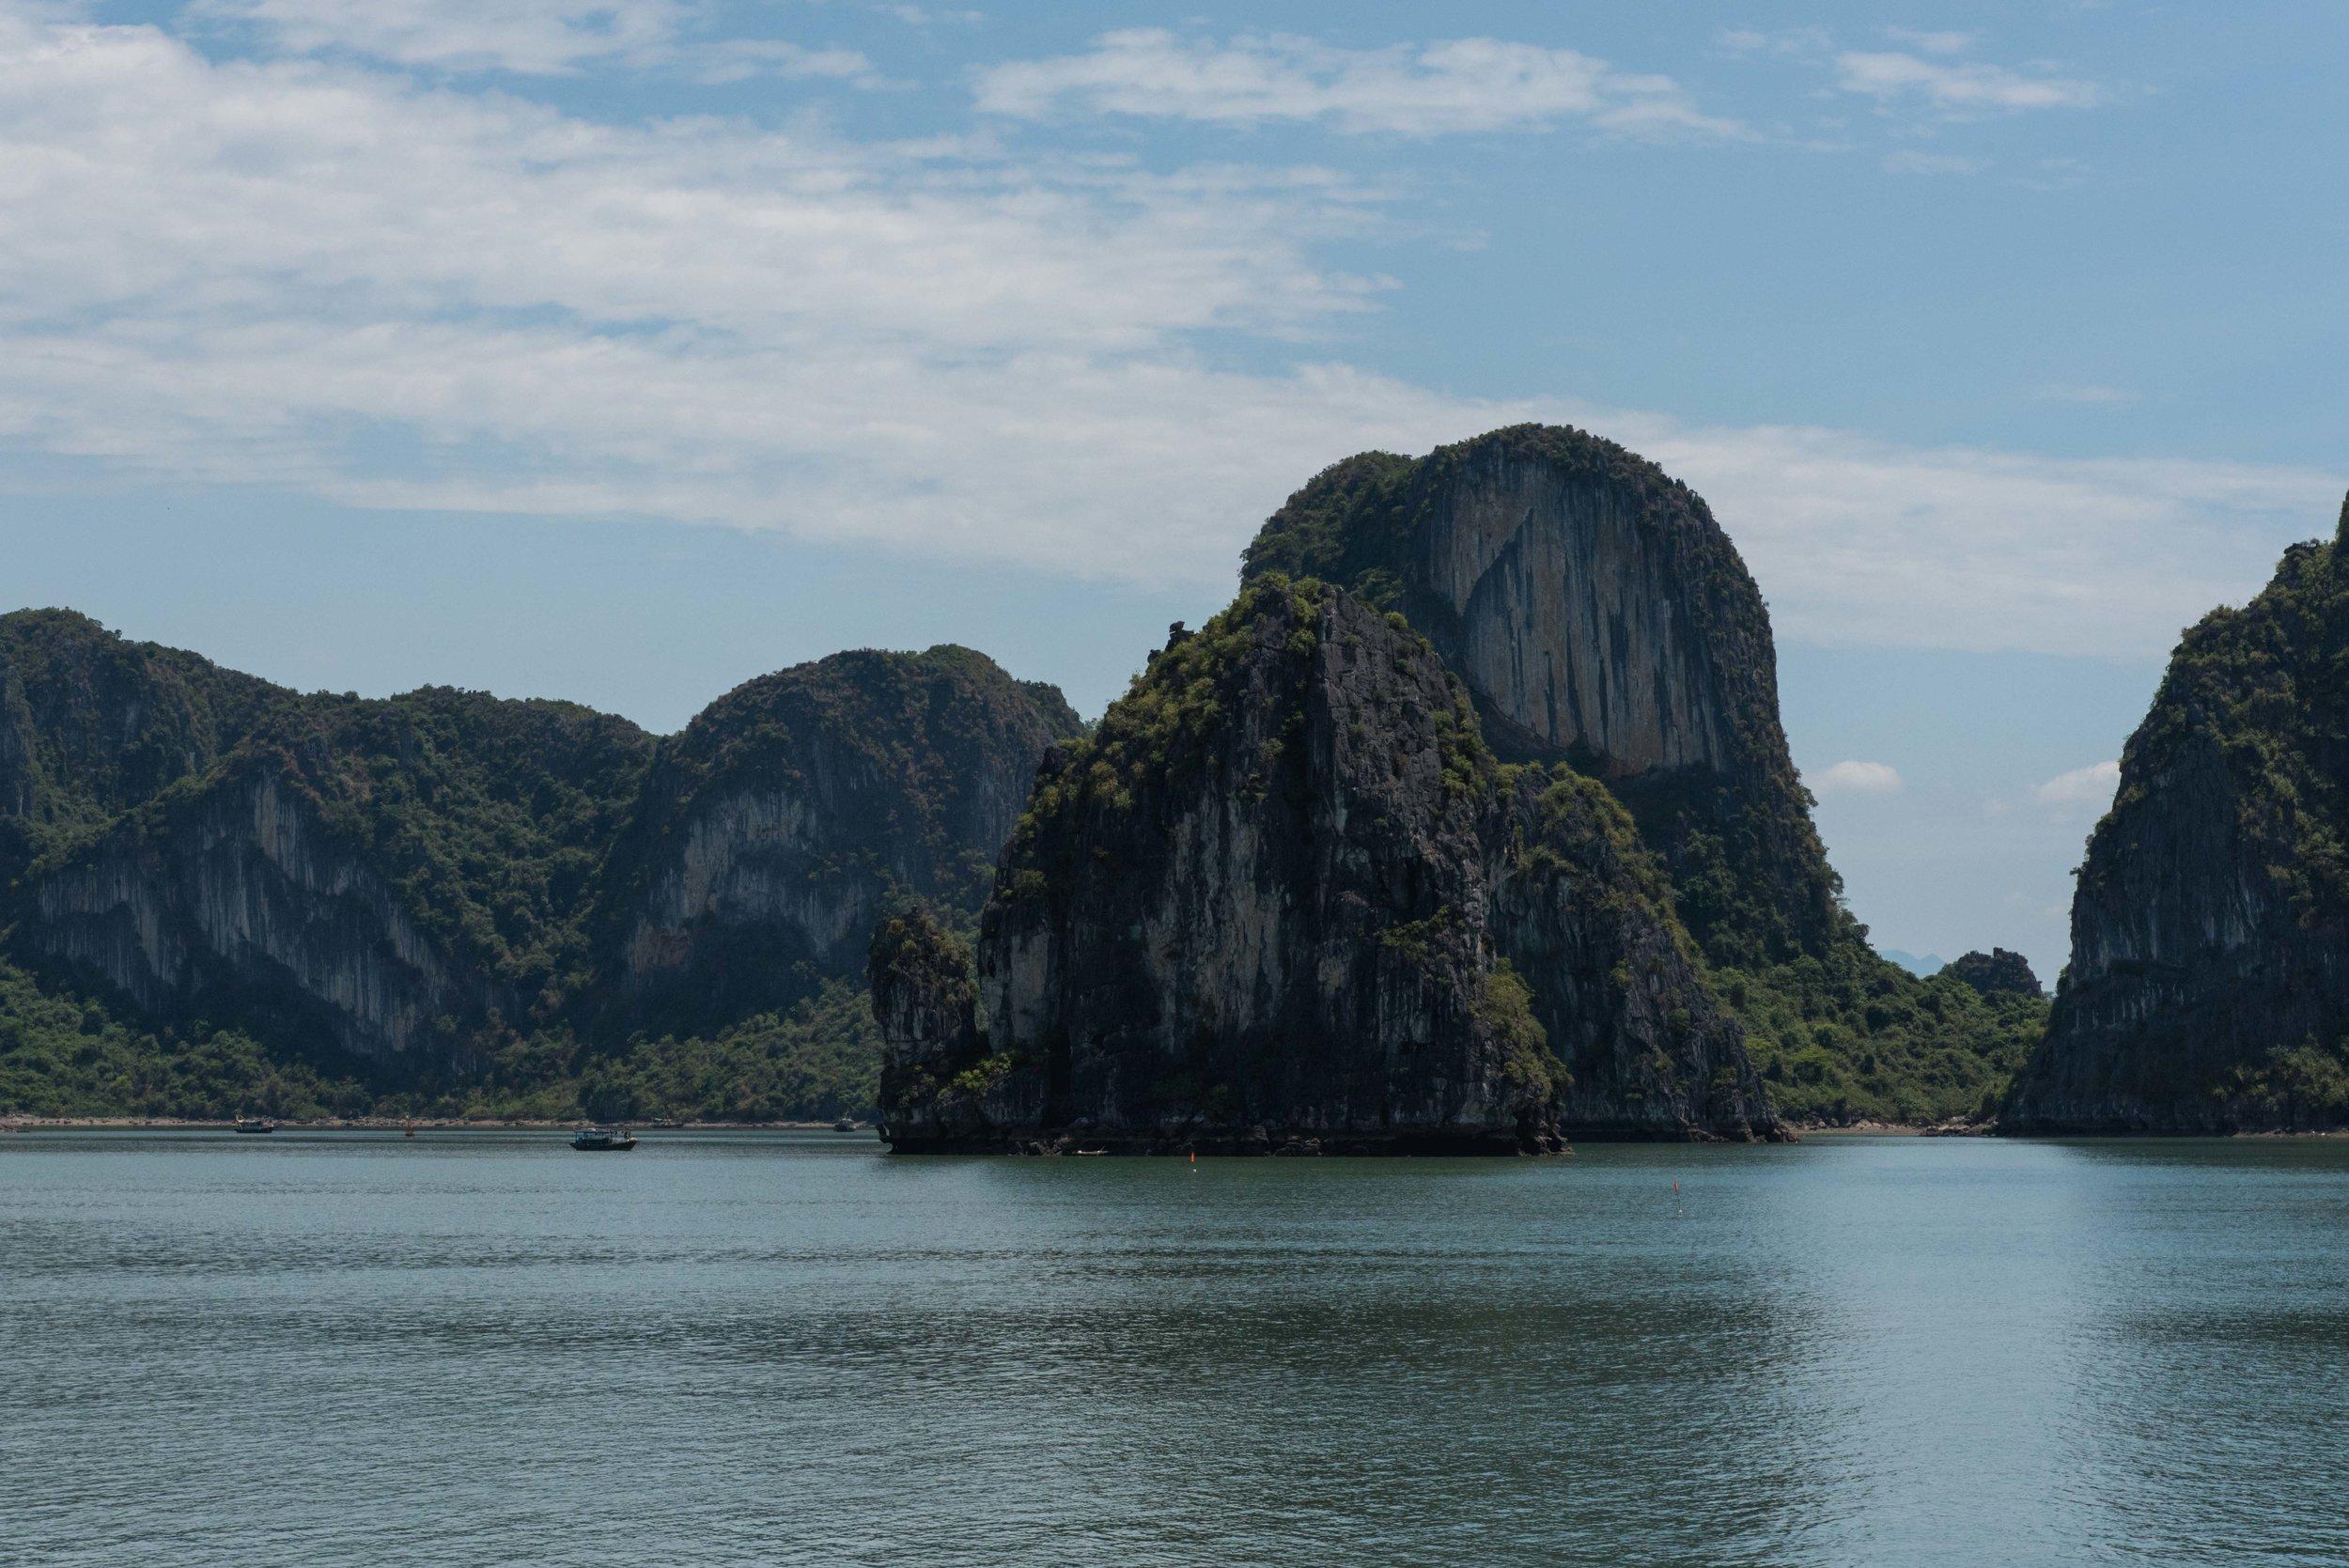 Vietnamese Half-Dome